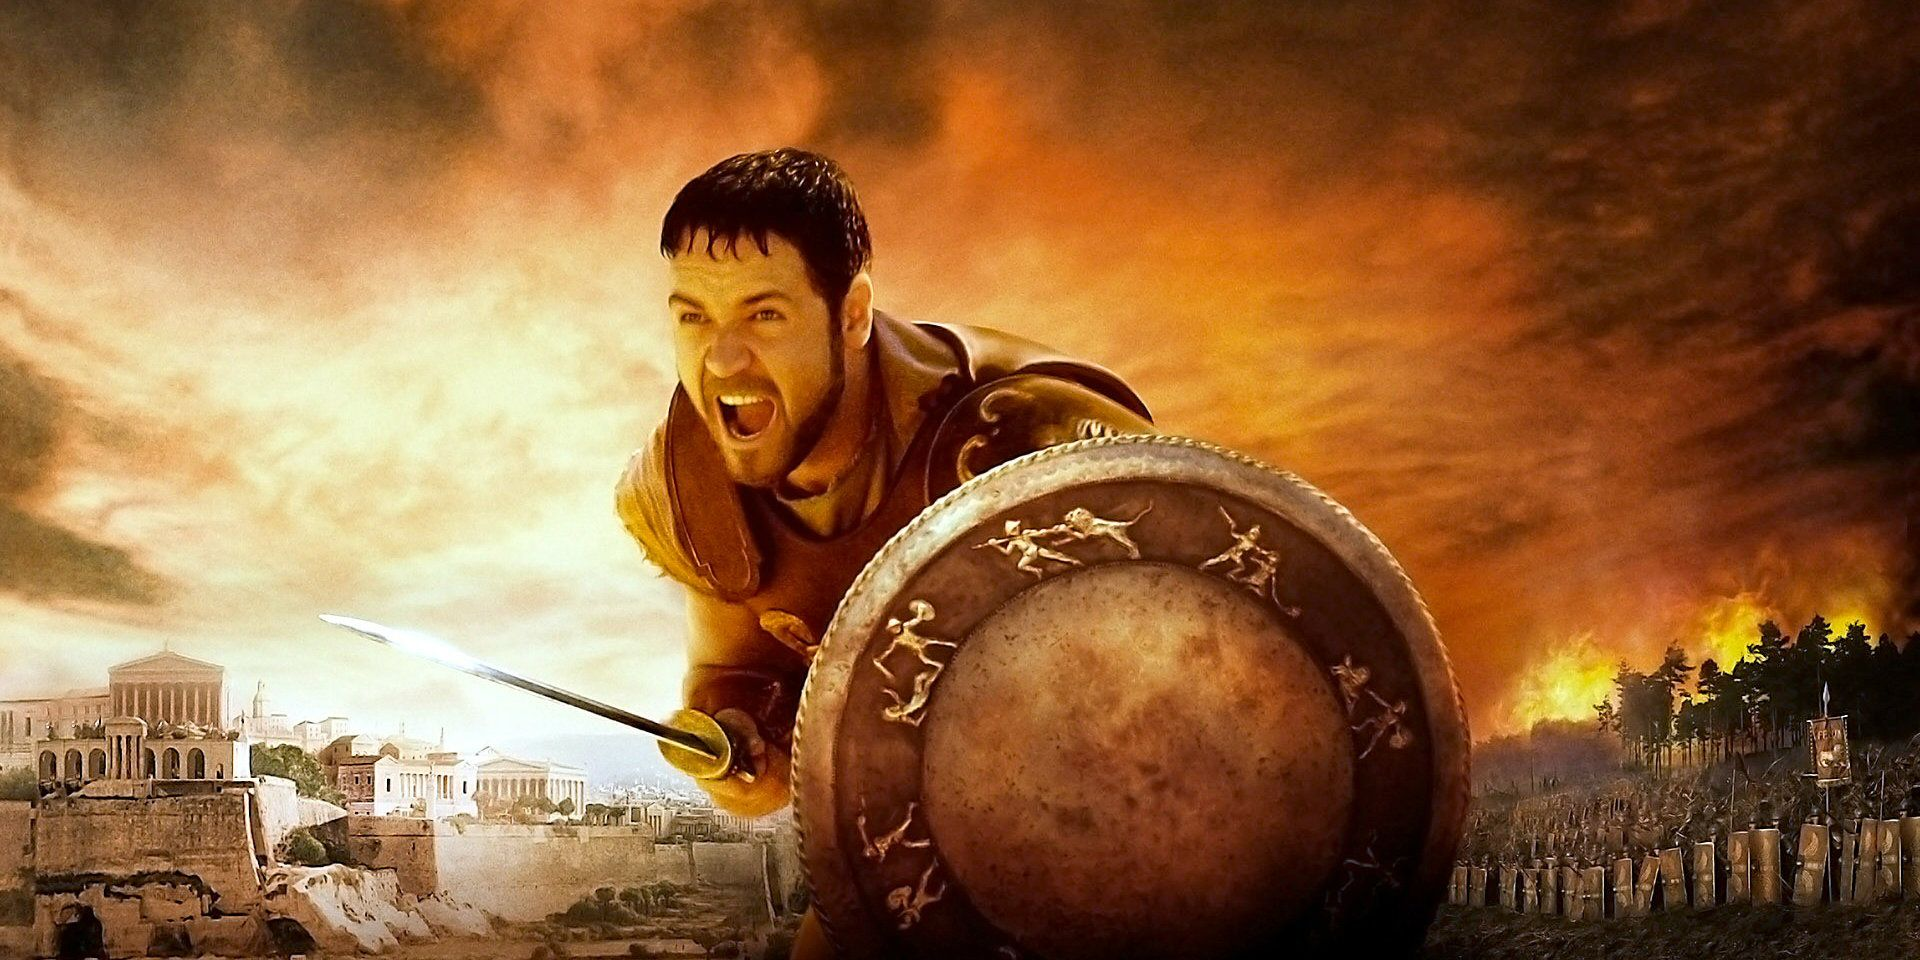 Ridley Scott Is Developing Gladiator 2 With Top Gun 2 Writer